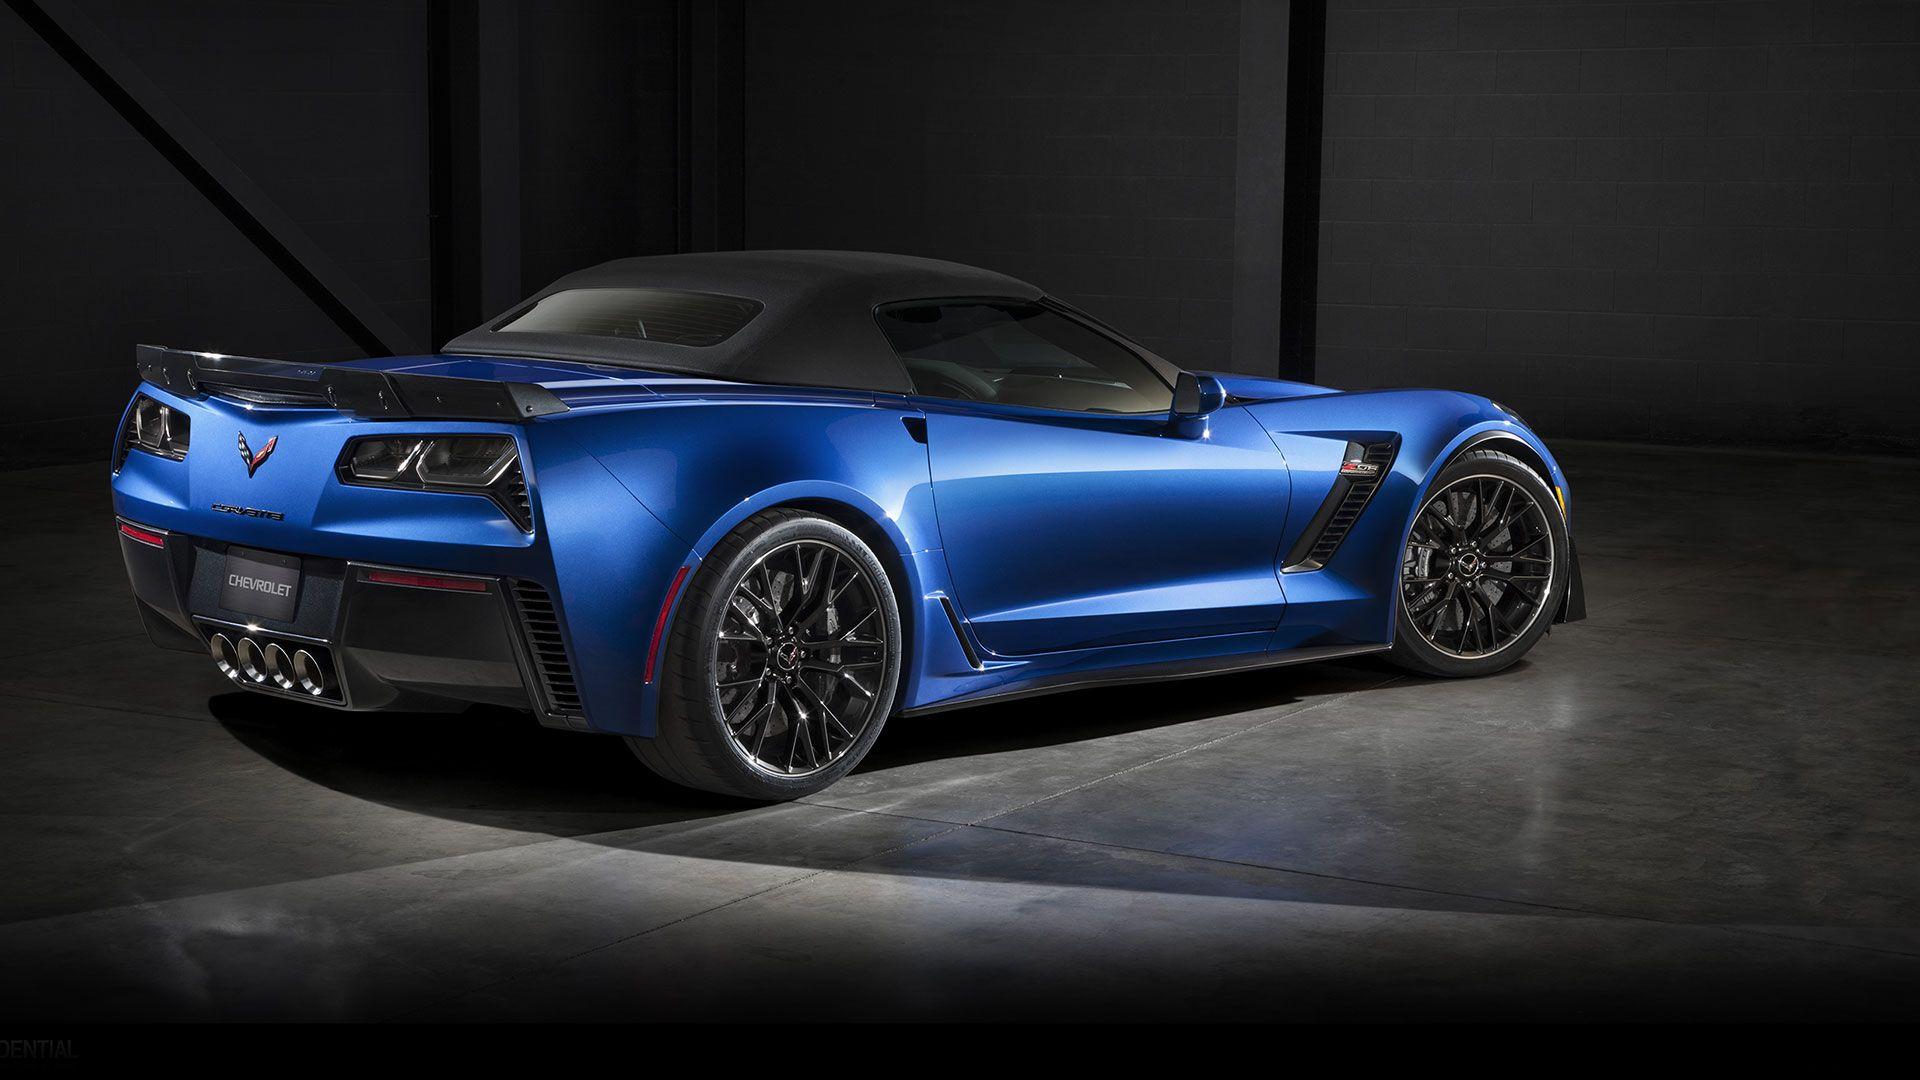 2015 Corvette Z06 convertible drag reduction Chevrolet